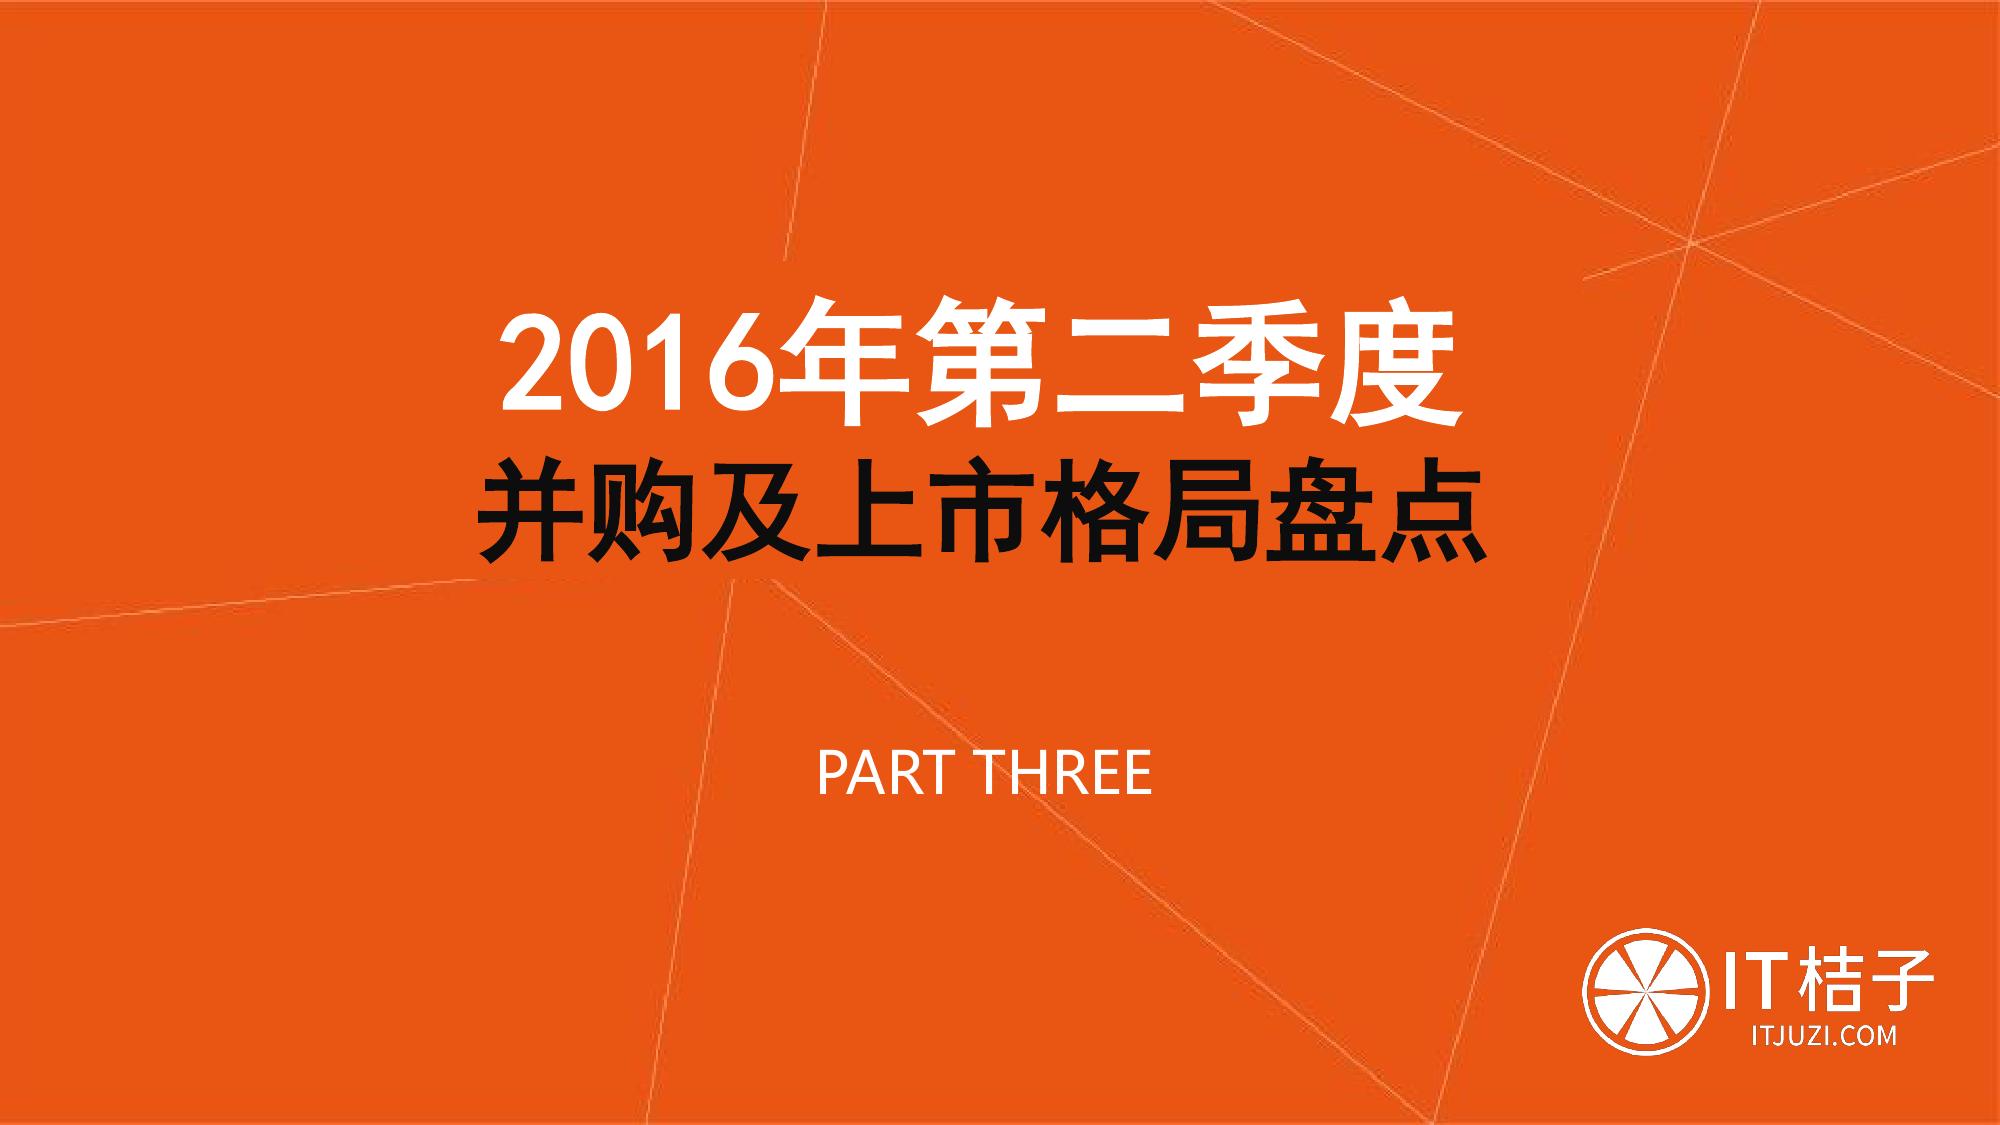 【IT桔子】2016年Q2中国互联网创业投资分析报告_000021